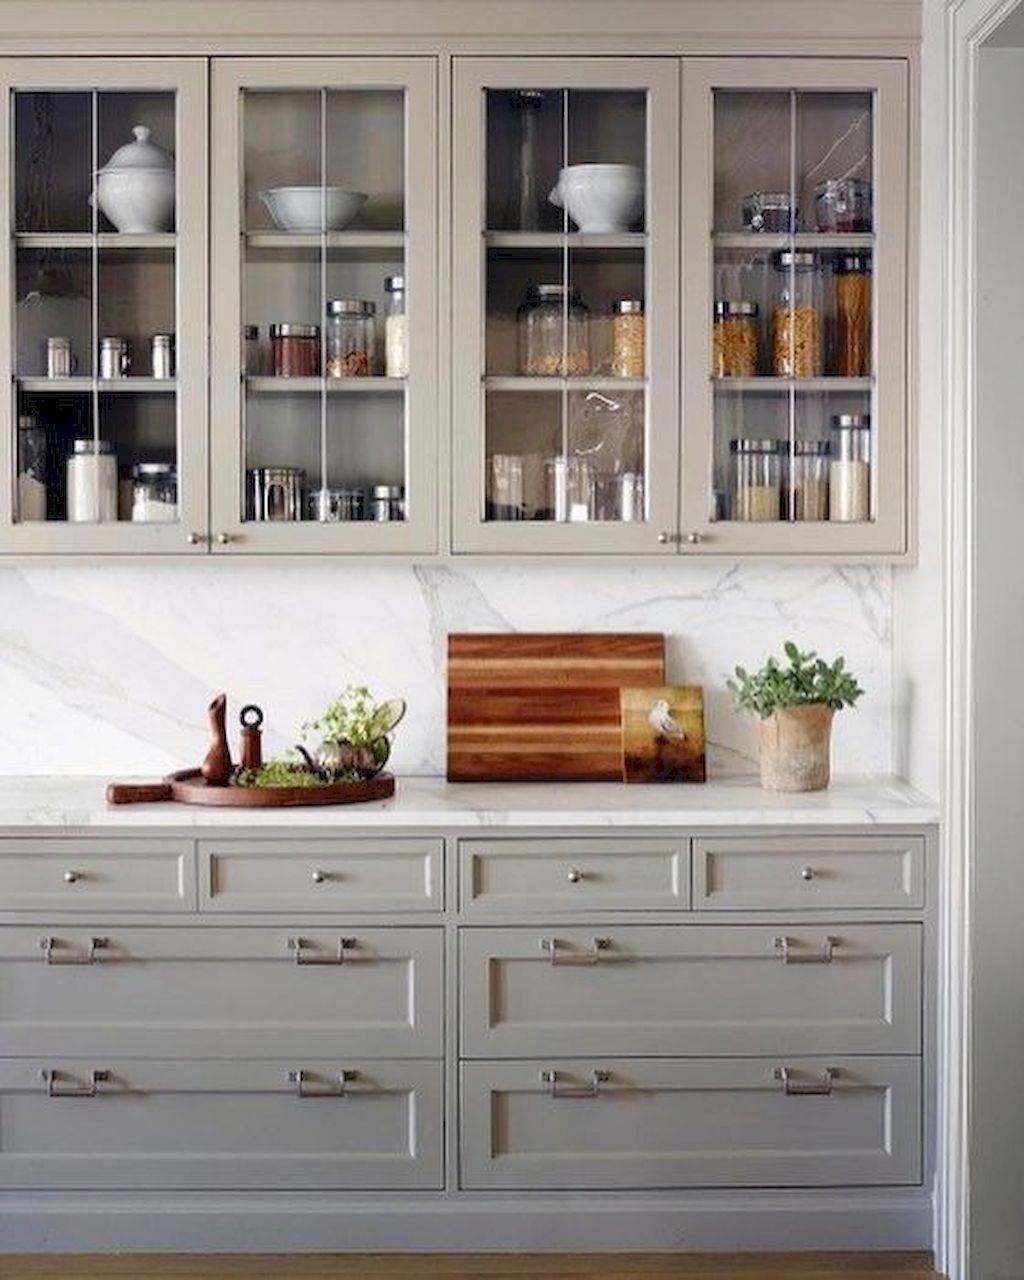 10x10 Kitchen Remodel: Have A Peek At This Web-site Talking Around 10x10 Kitchen